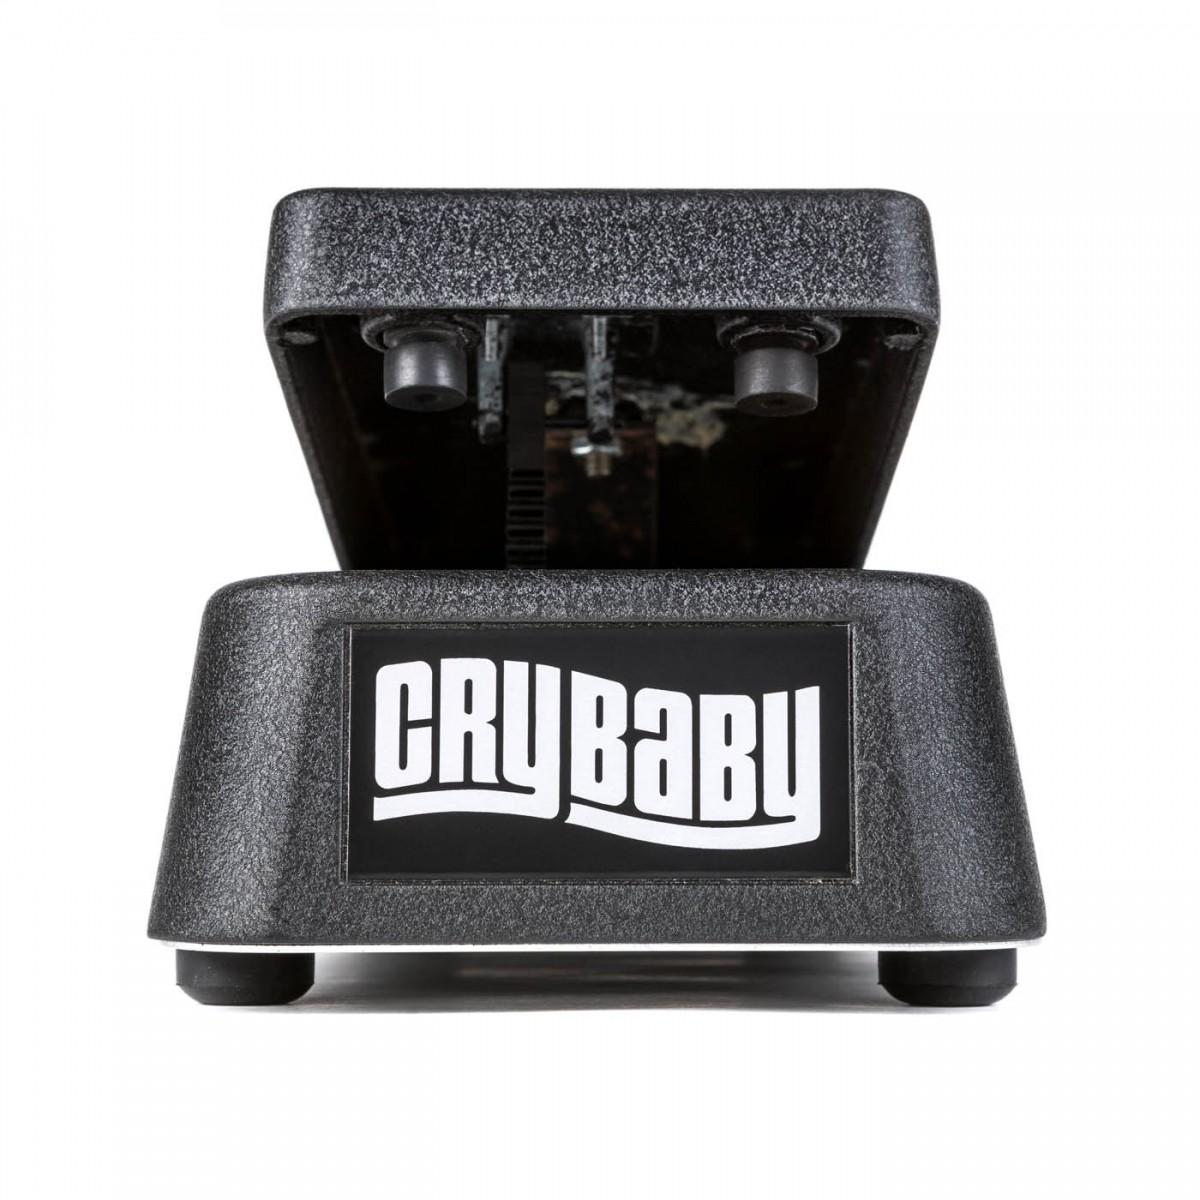 Pedal Expressão Dunlop Crybaby 95Q Wah Wah